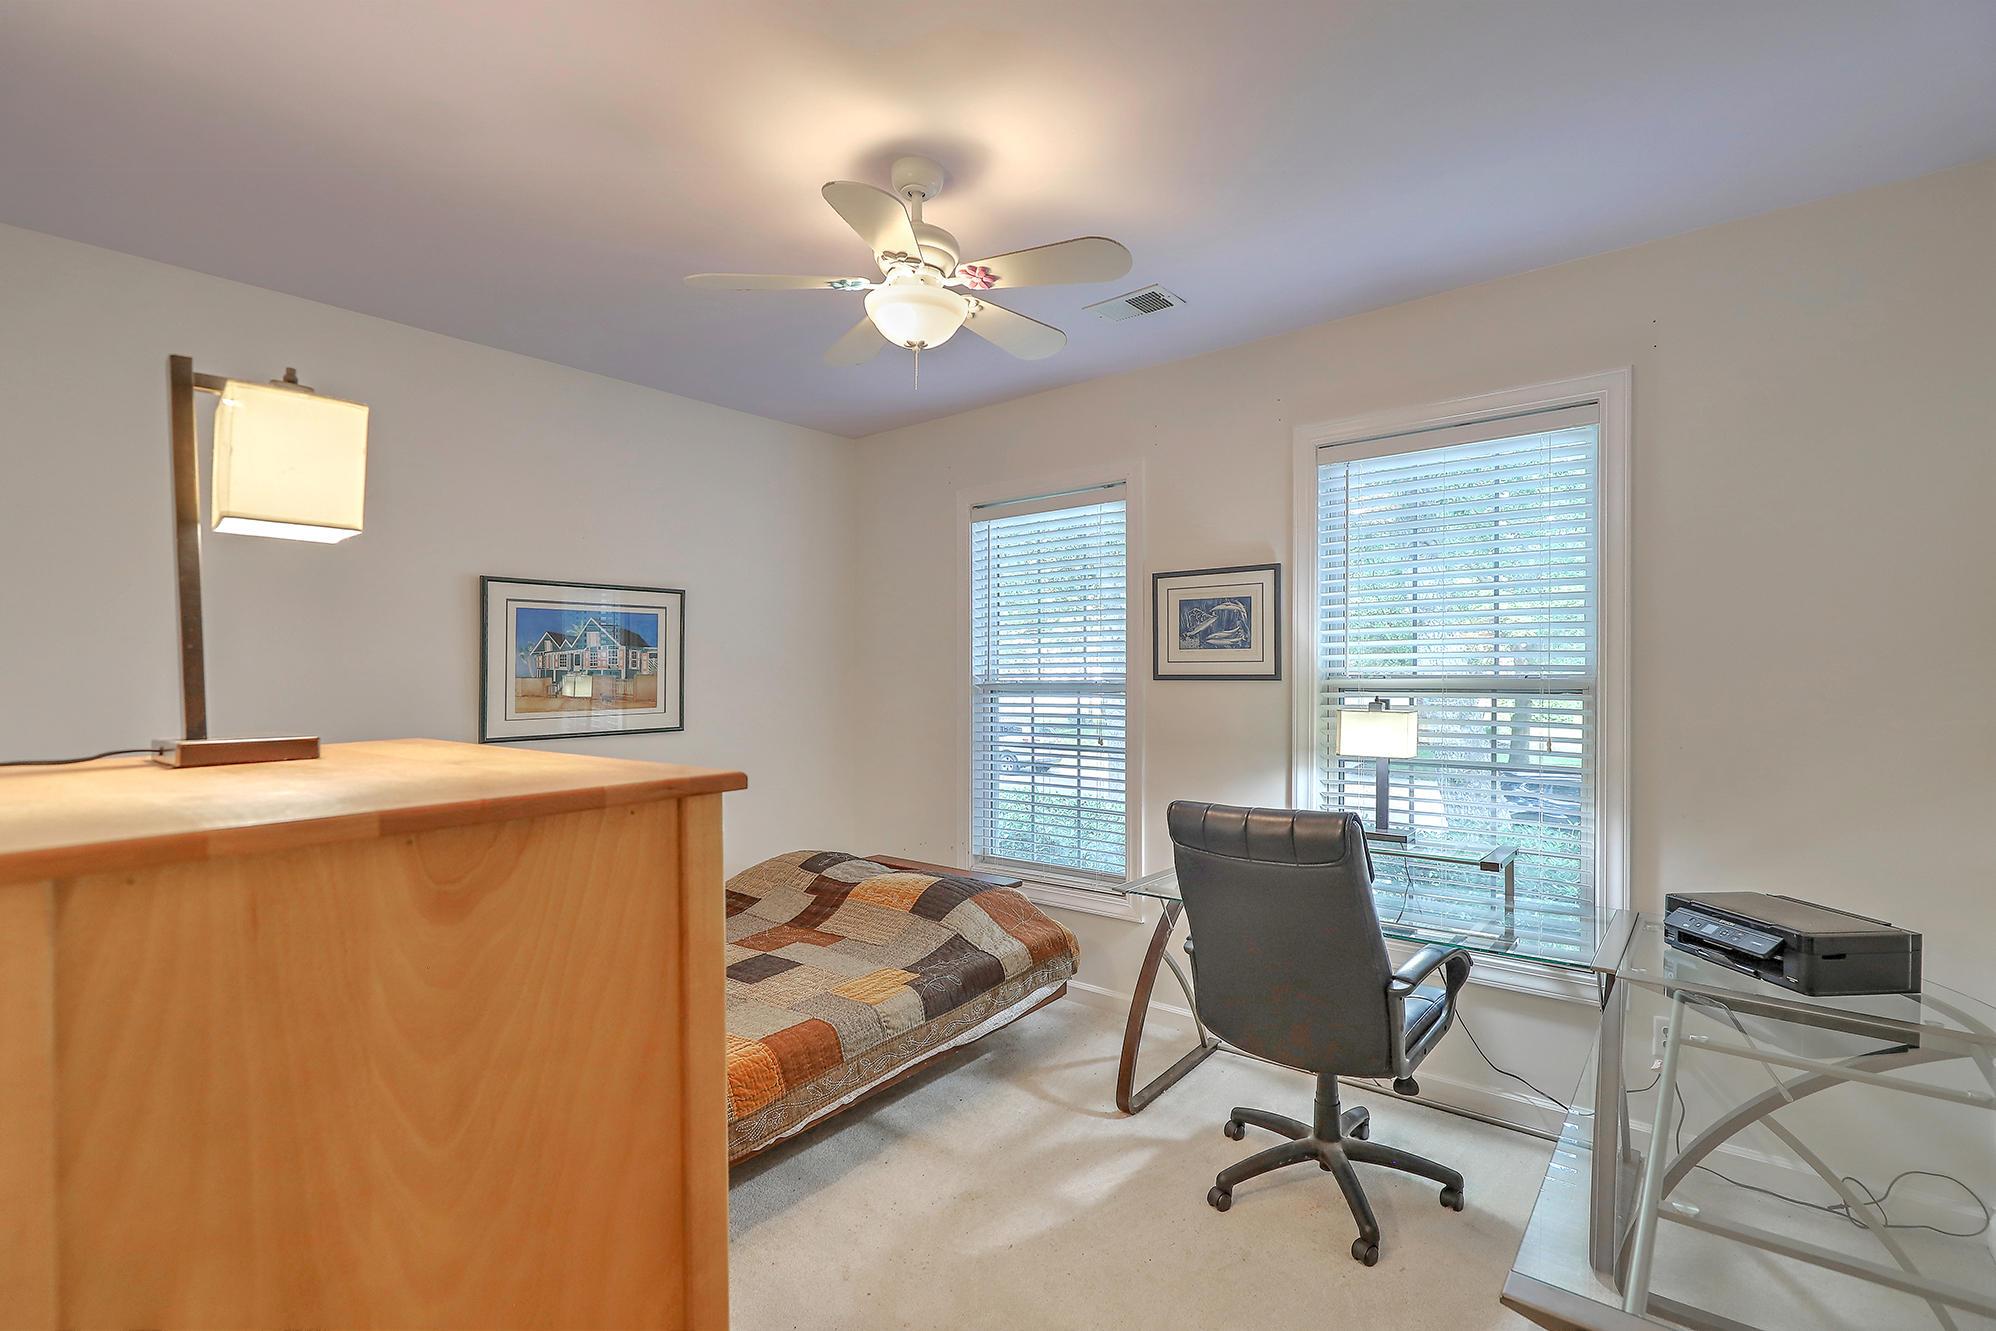 Seaside Farms Homes For Sale - 1244 Palmetto Peninsula, Mount Pleasant, SC - 24